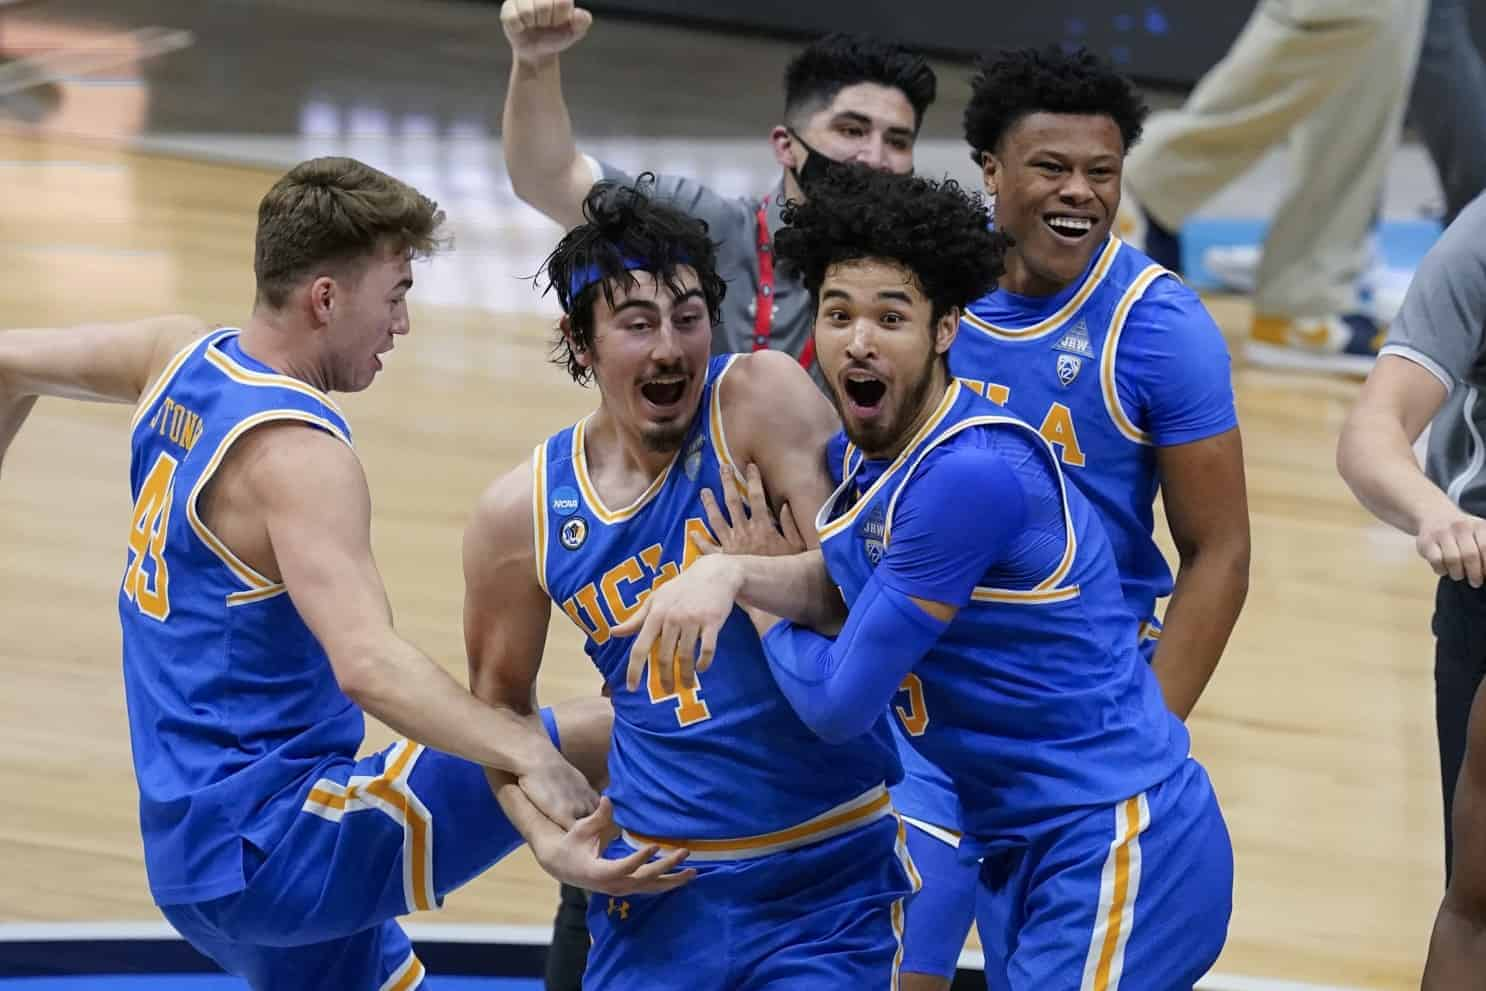 BasketballNcaa - UCLA Bruins